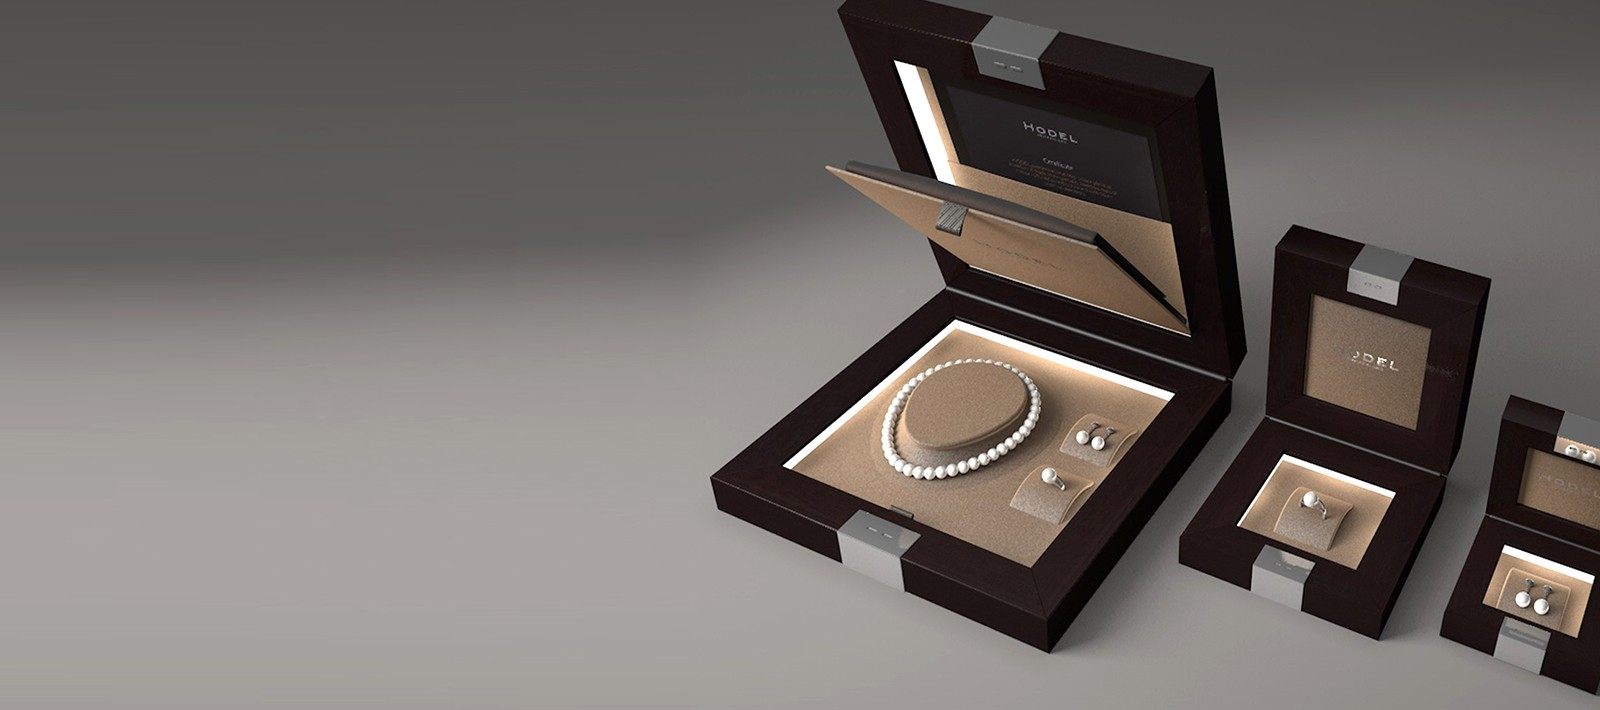 Hodel-jewellery-packaging-design